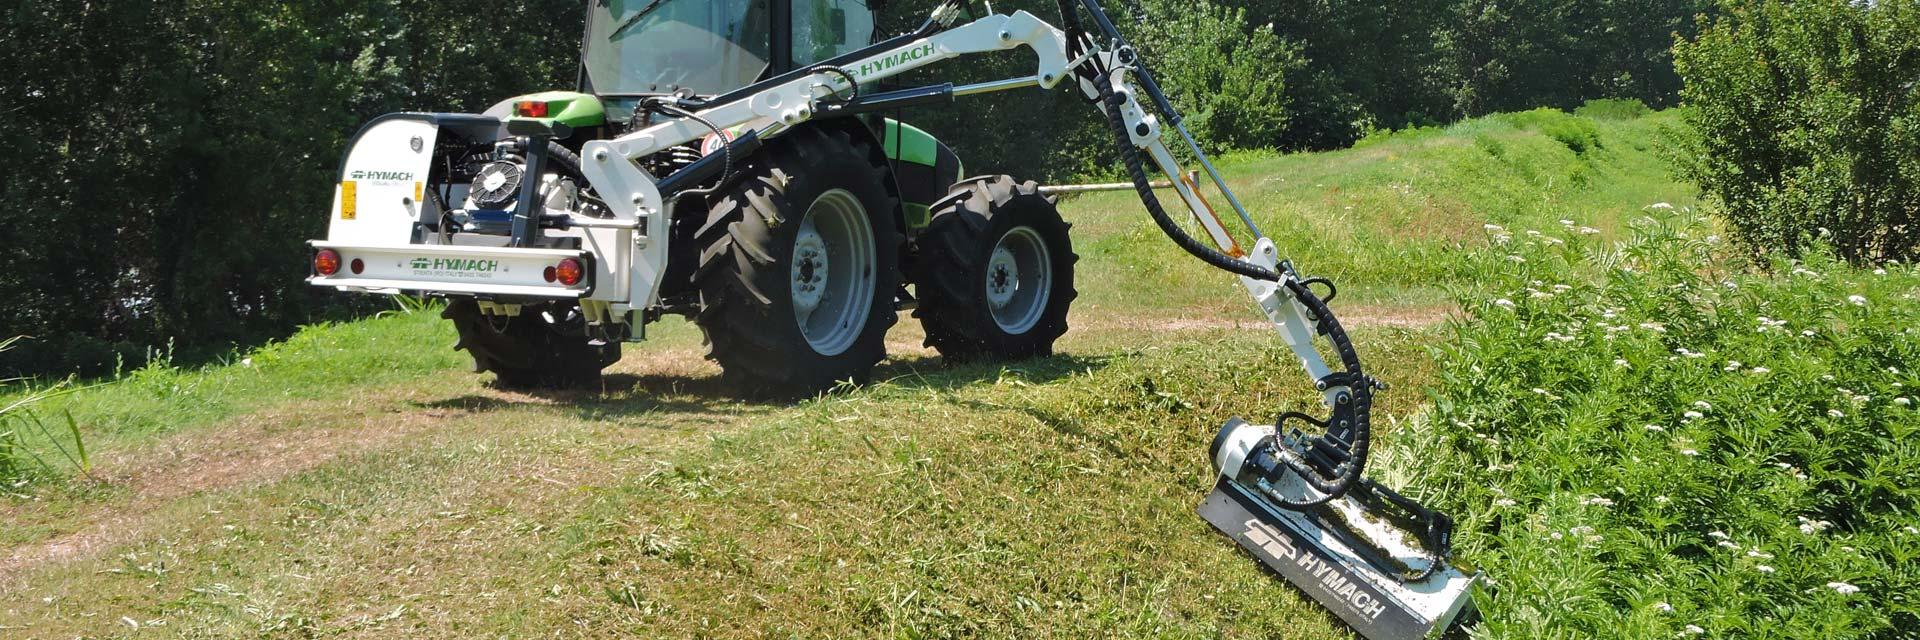 Maintenance of green